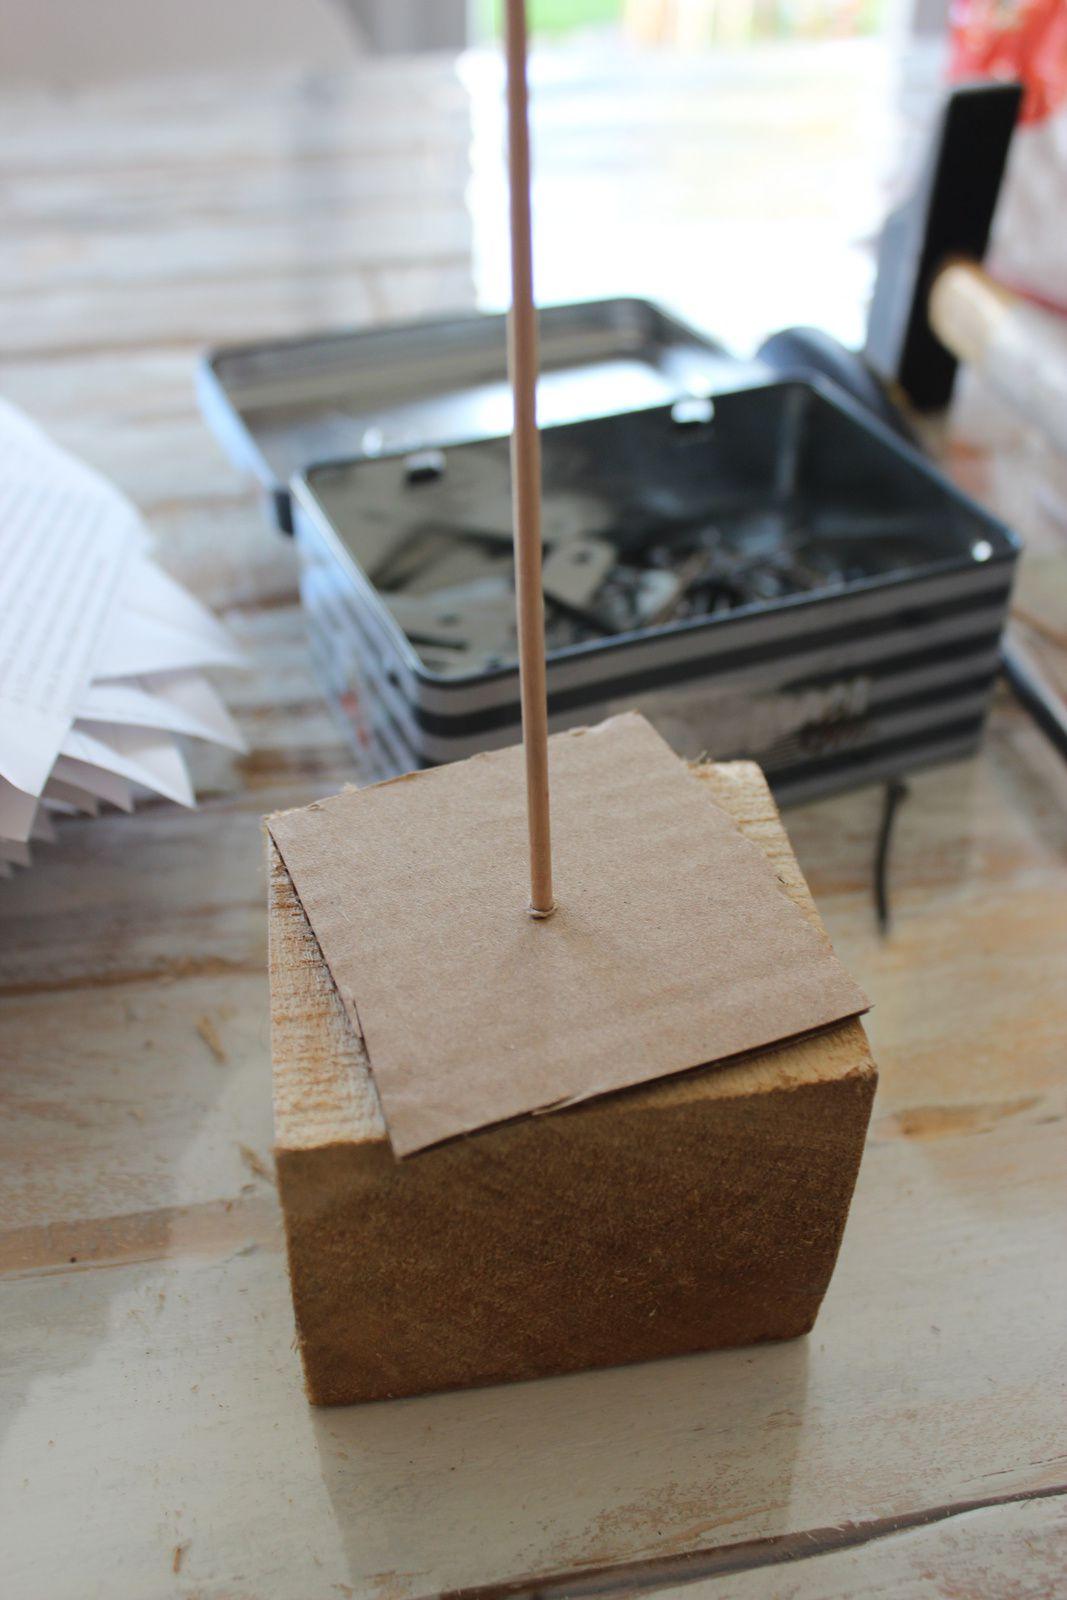 mettre un carré de carton... http://luniversdegarfield59.over-blog.com